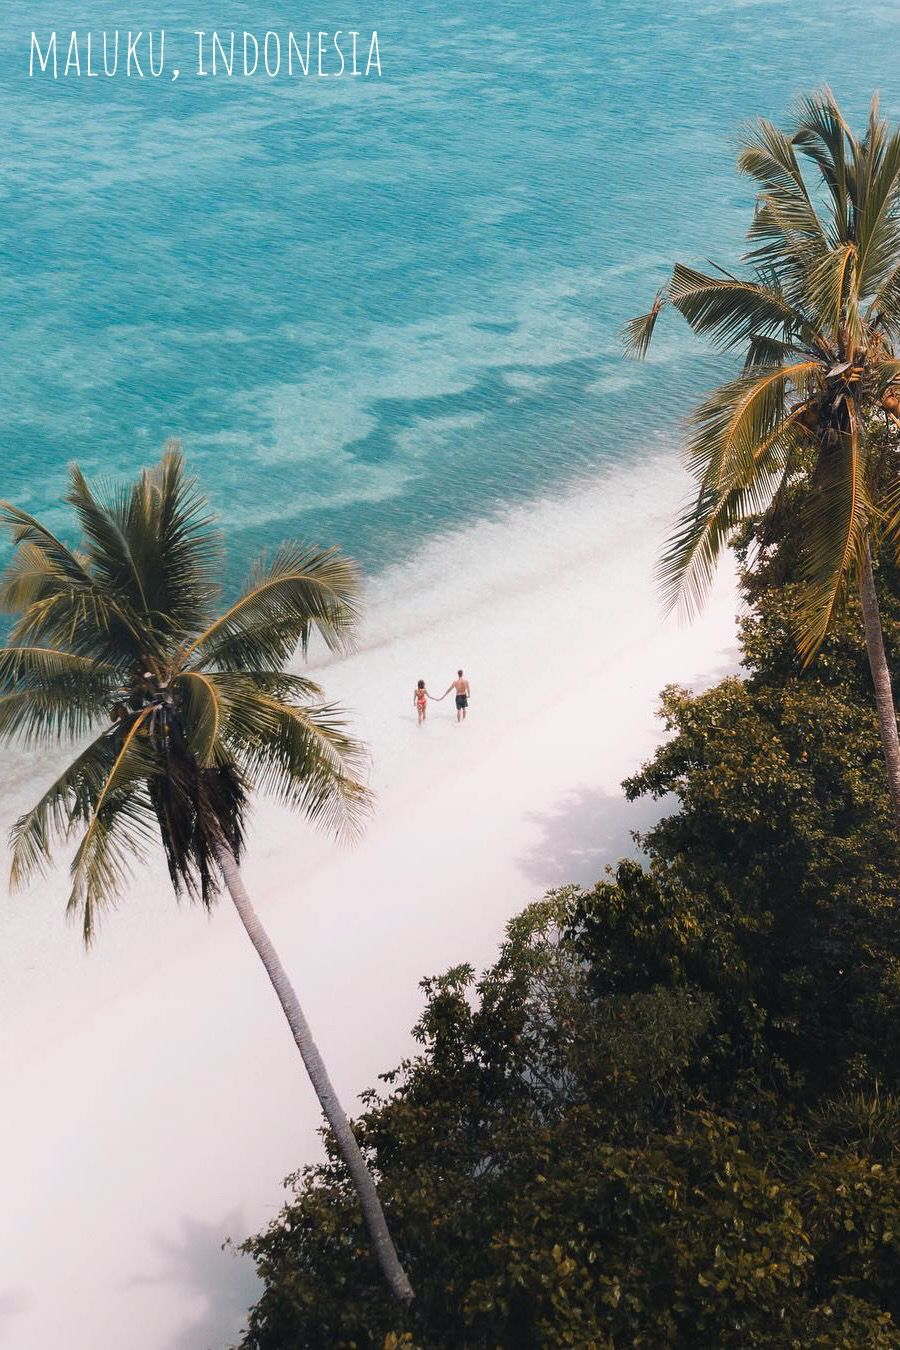 Maluku, Indonesia. The Maluku Islands Or The Moluccas Are